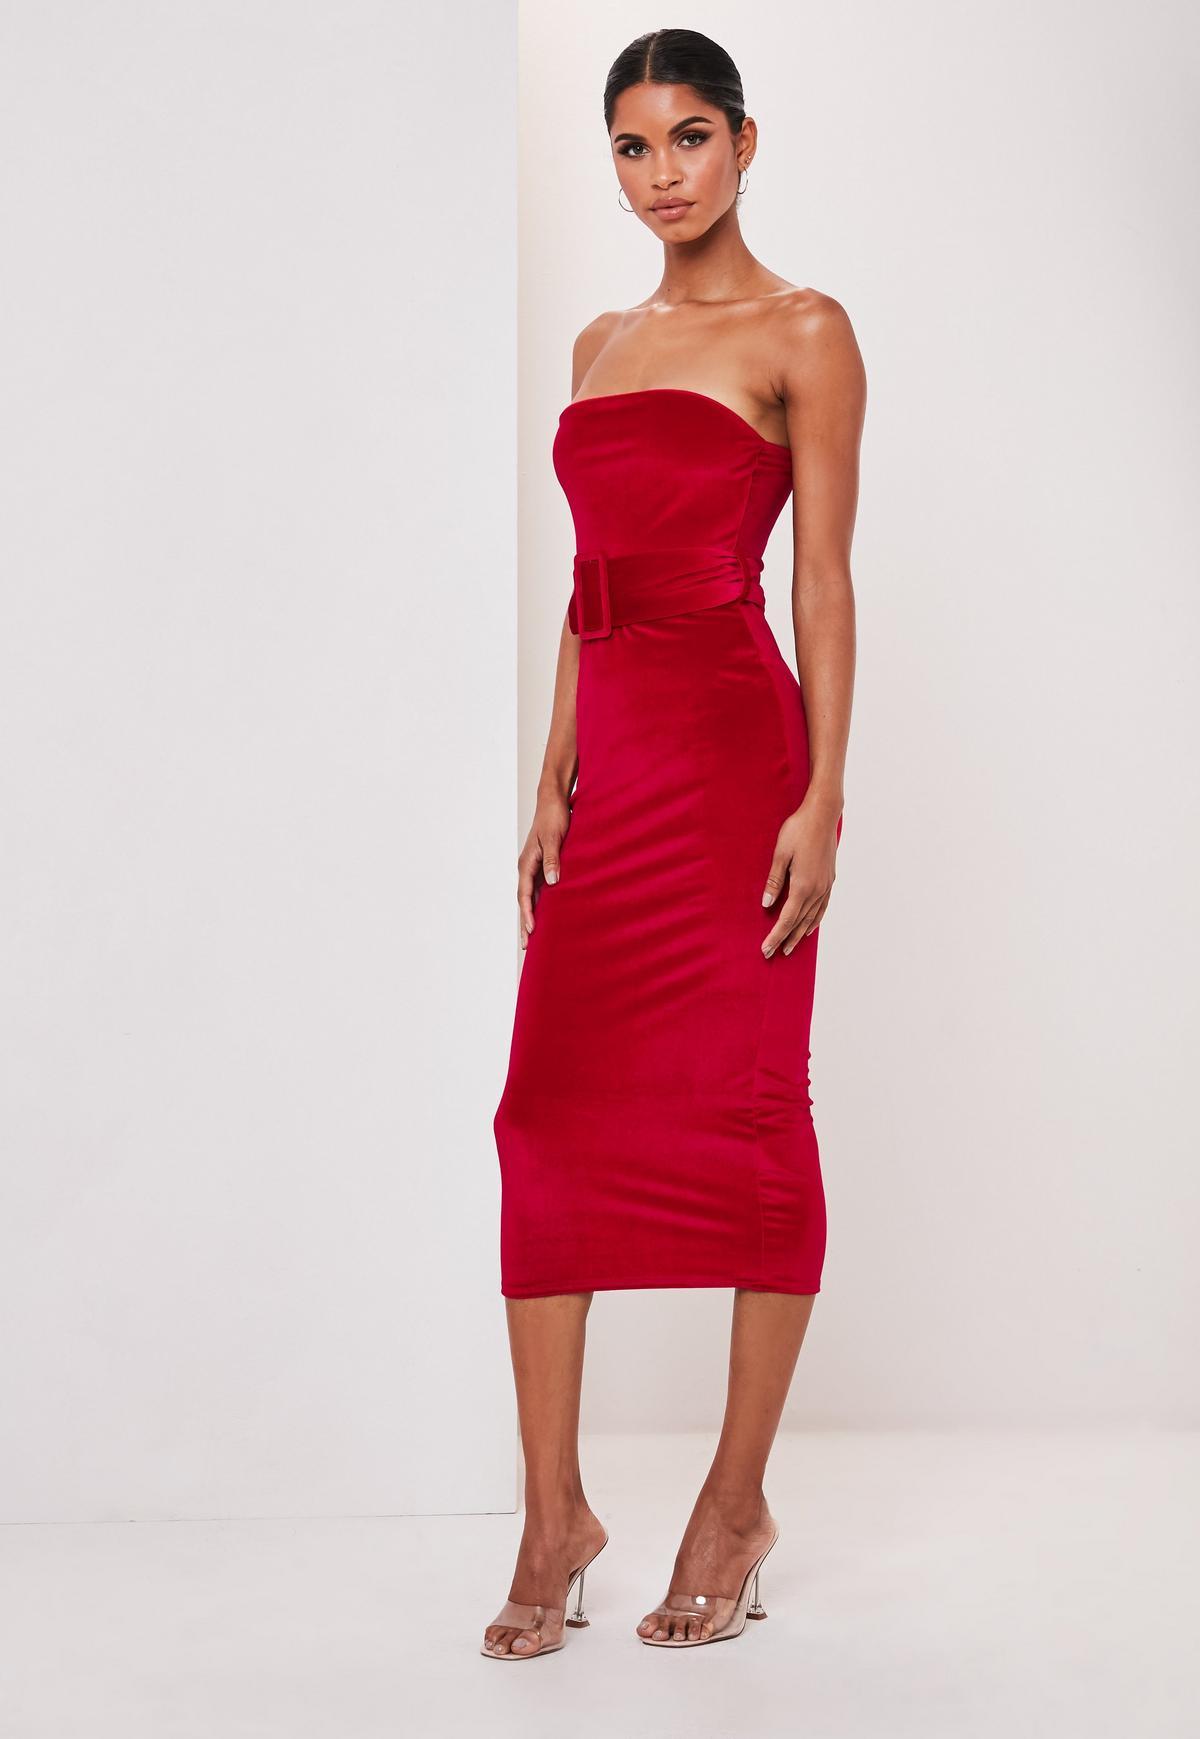 Wonderbaarlijk Red Velvet Bandeau Belted Midi Dress   Missguided FU-23